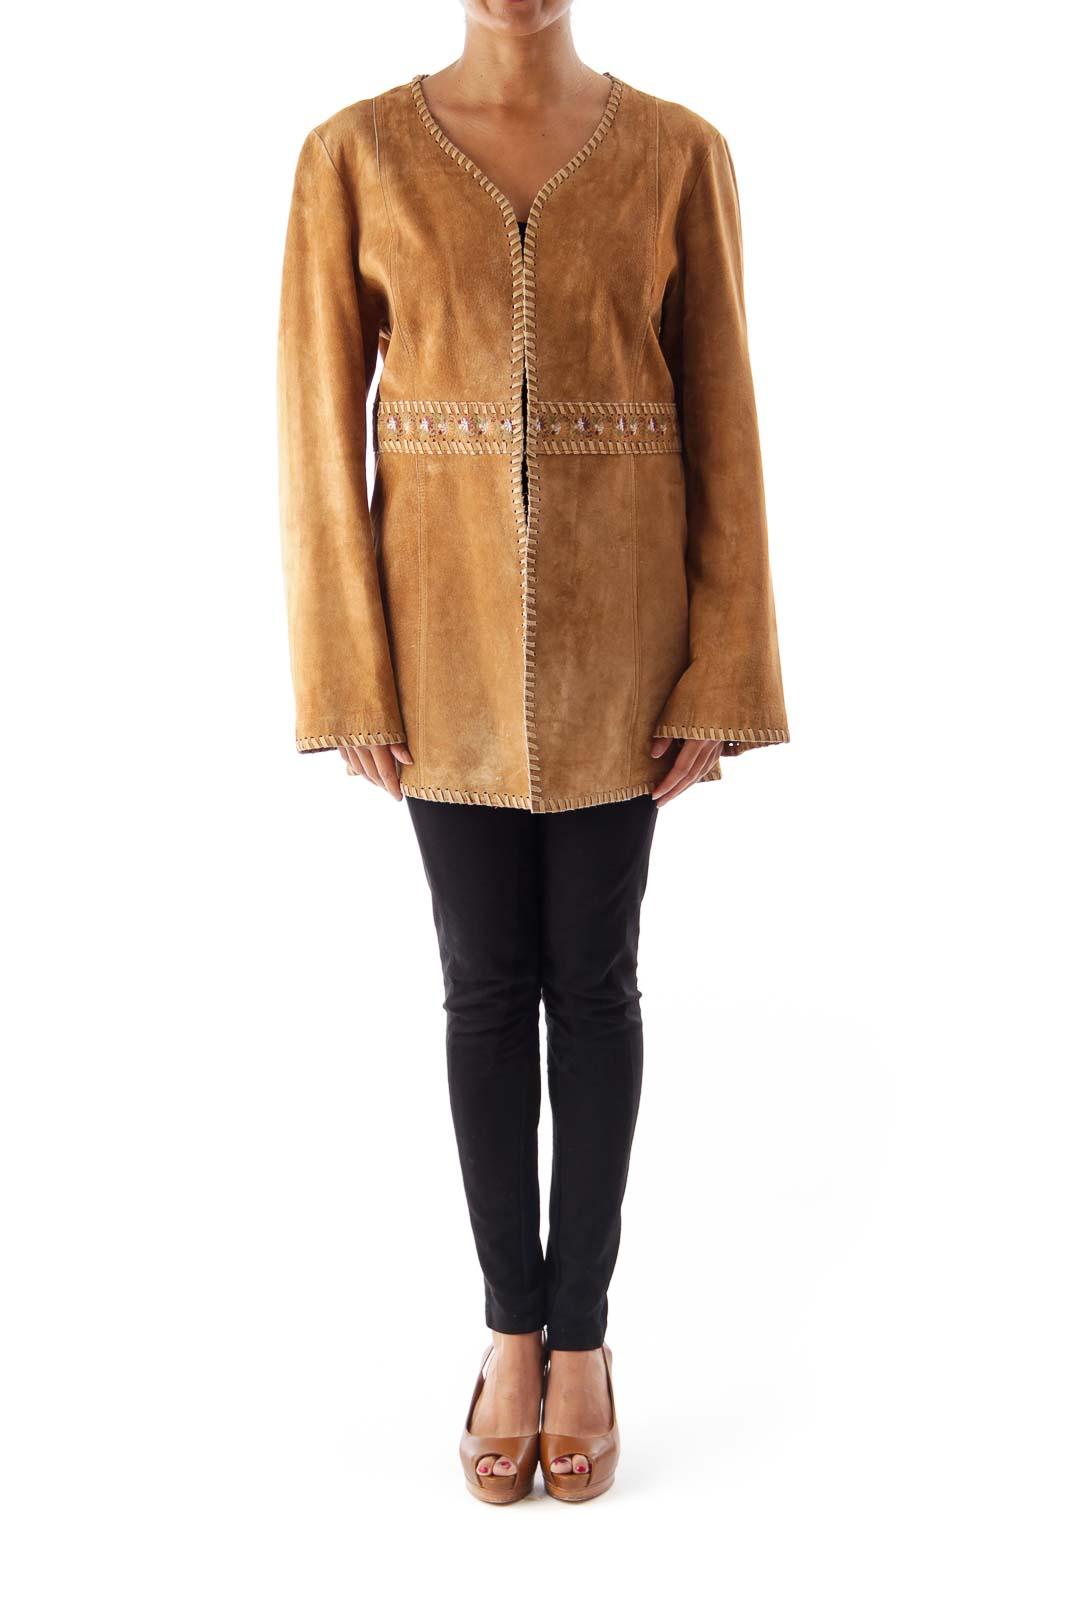 Brown Embroidered Boho Jacket